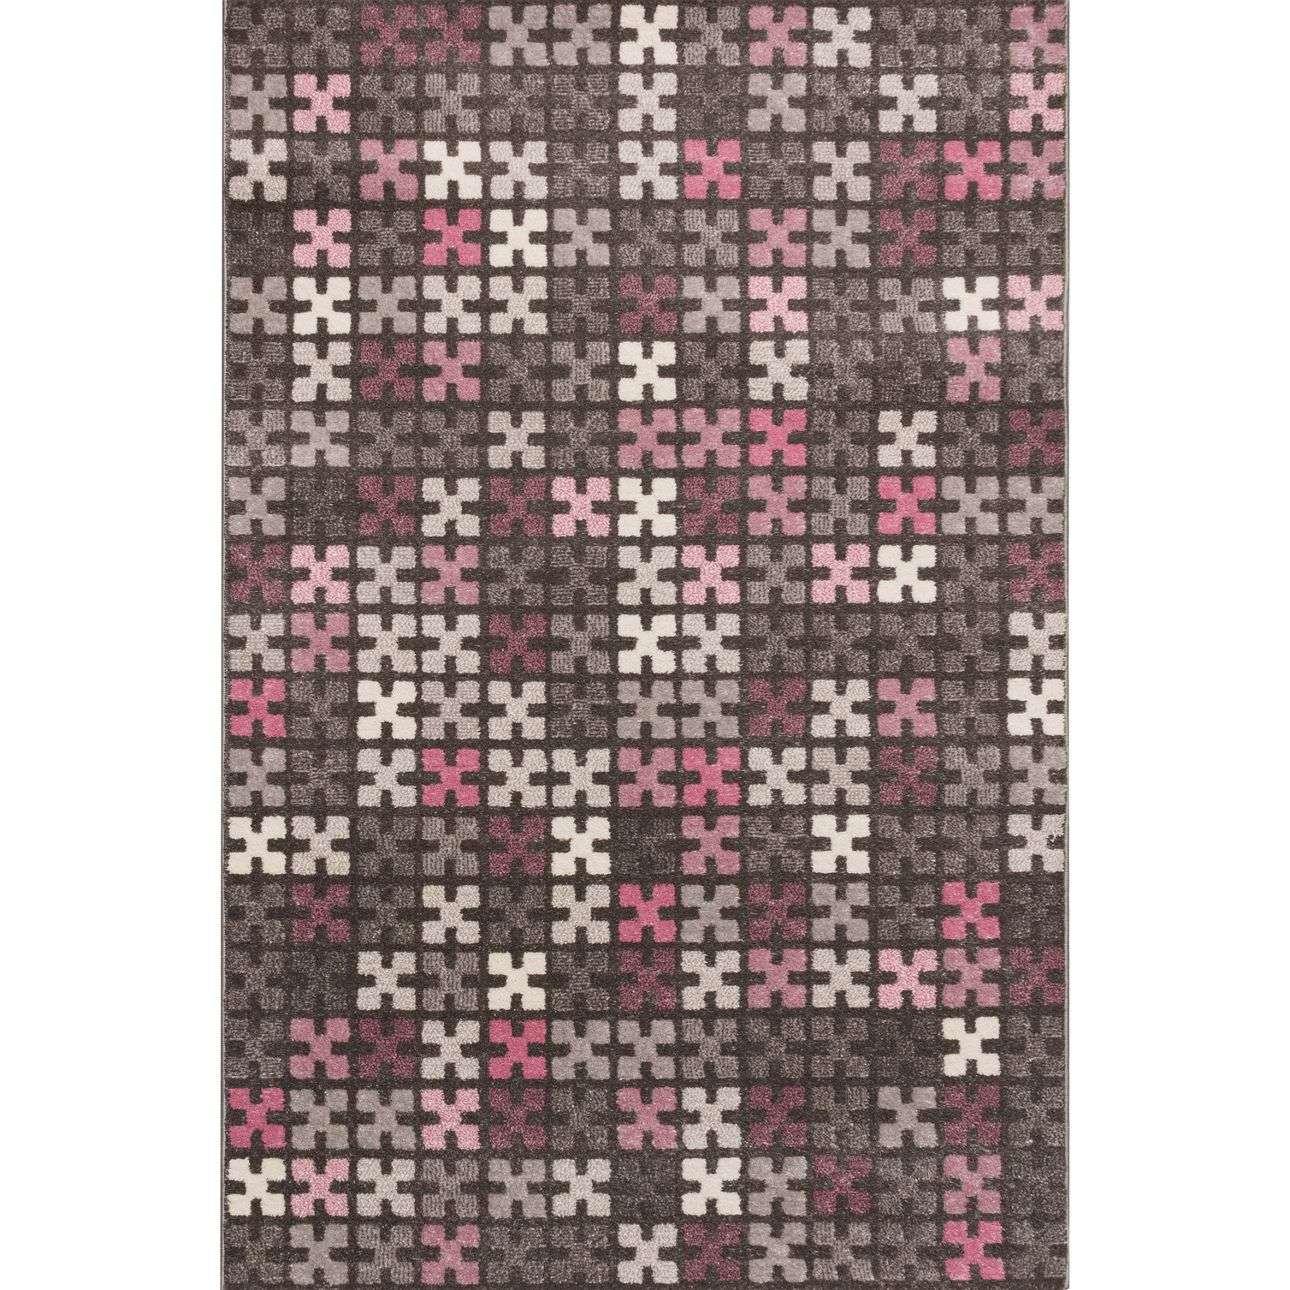 Koberec Modern Puzzle Charisma Rose-Frost Grey 135x190cm